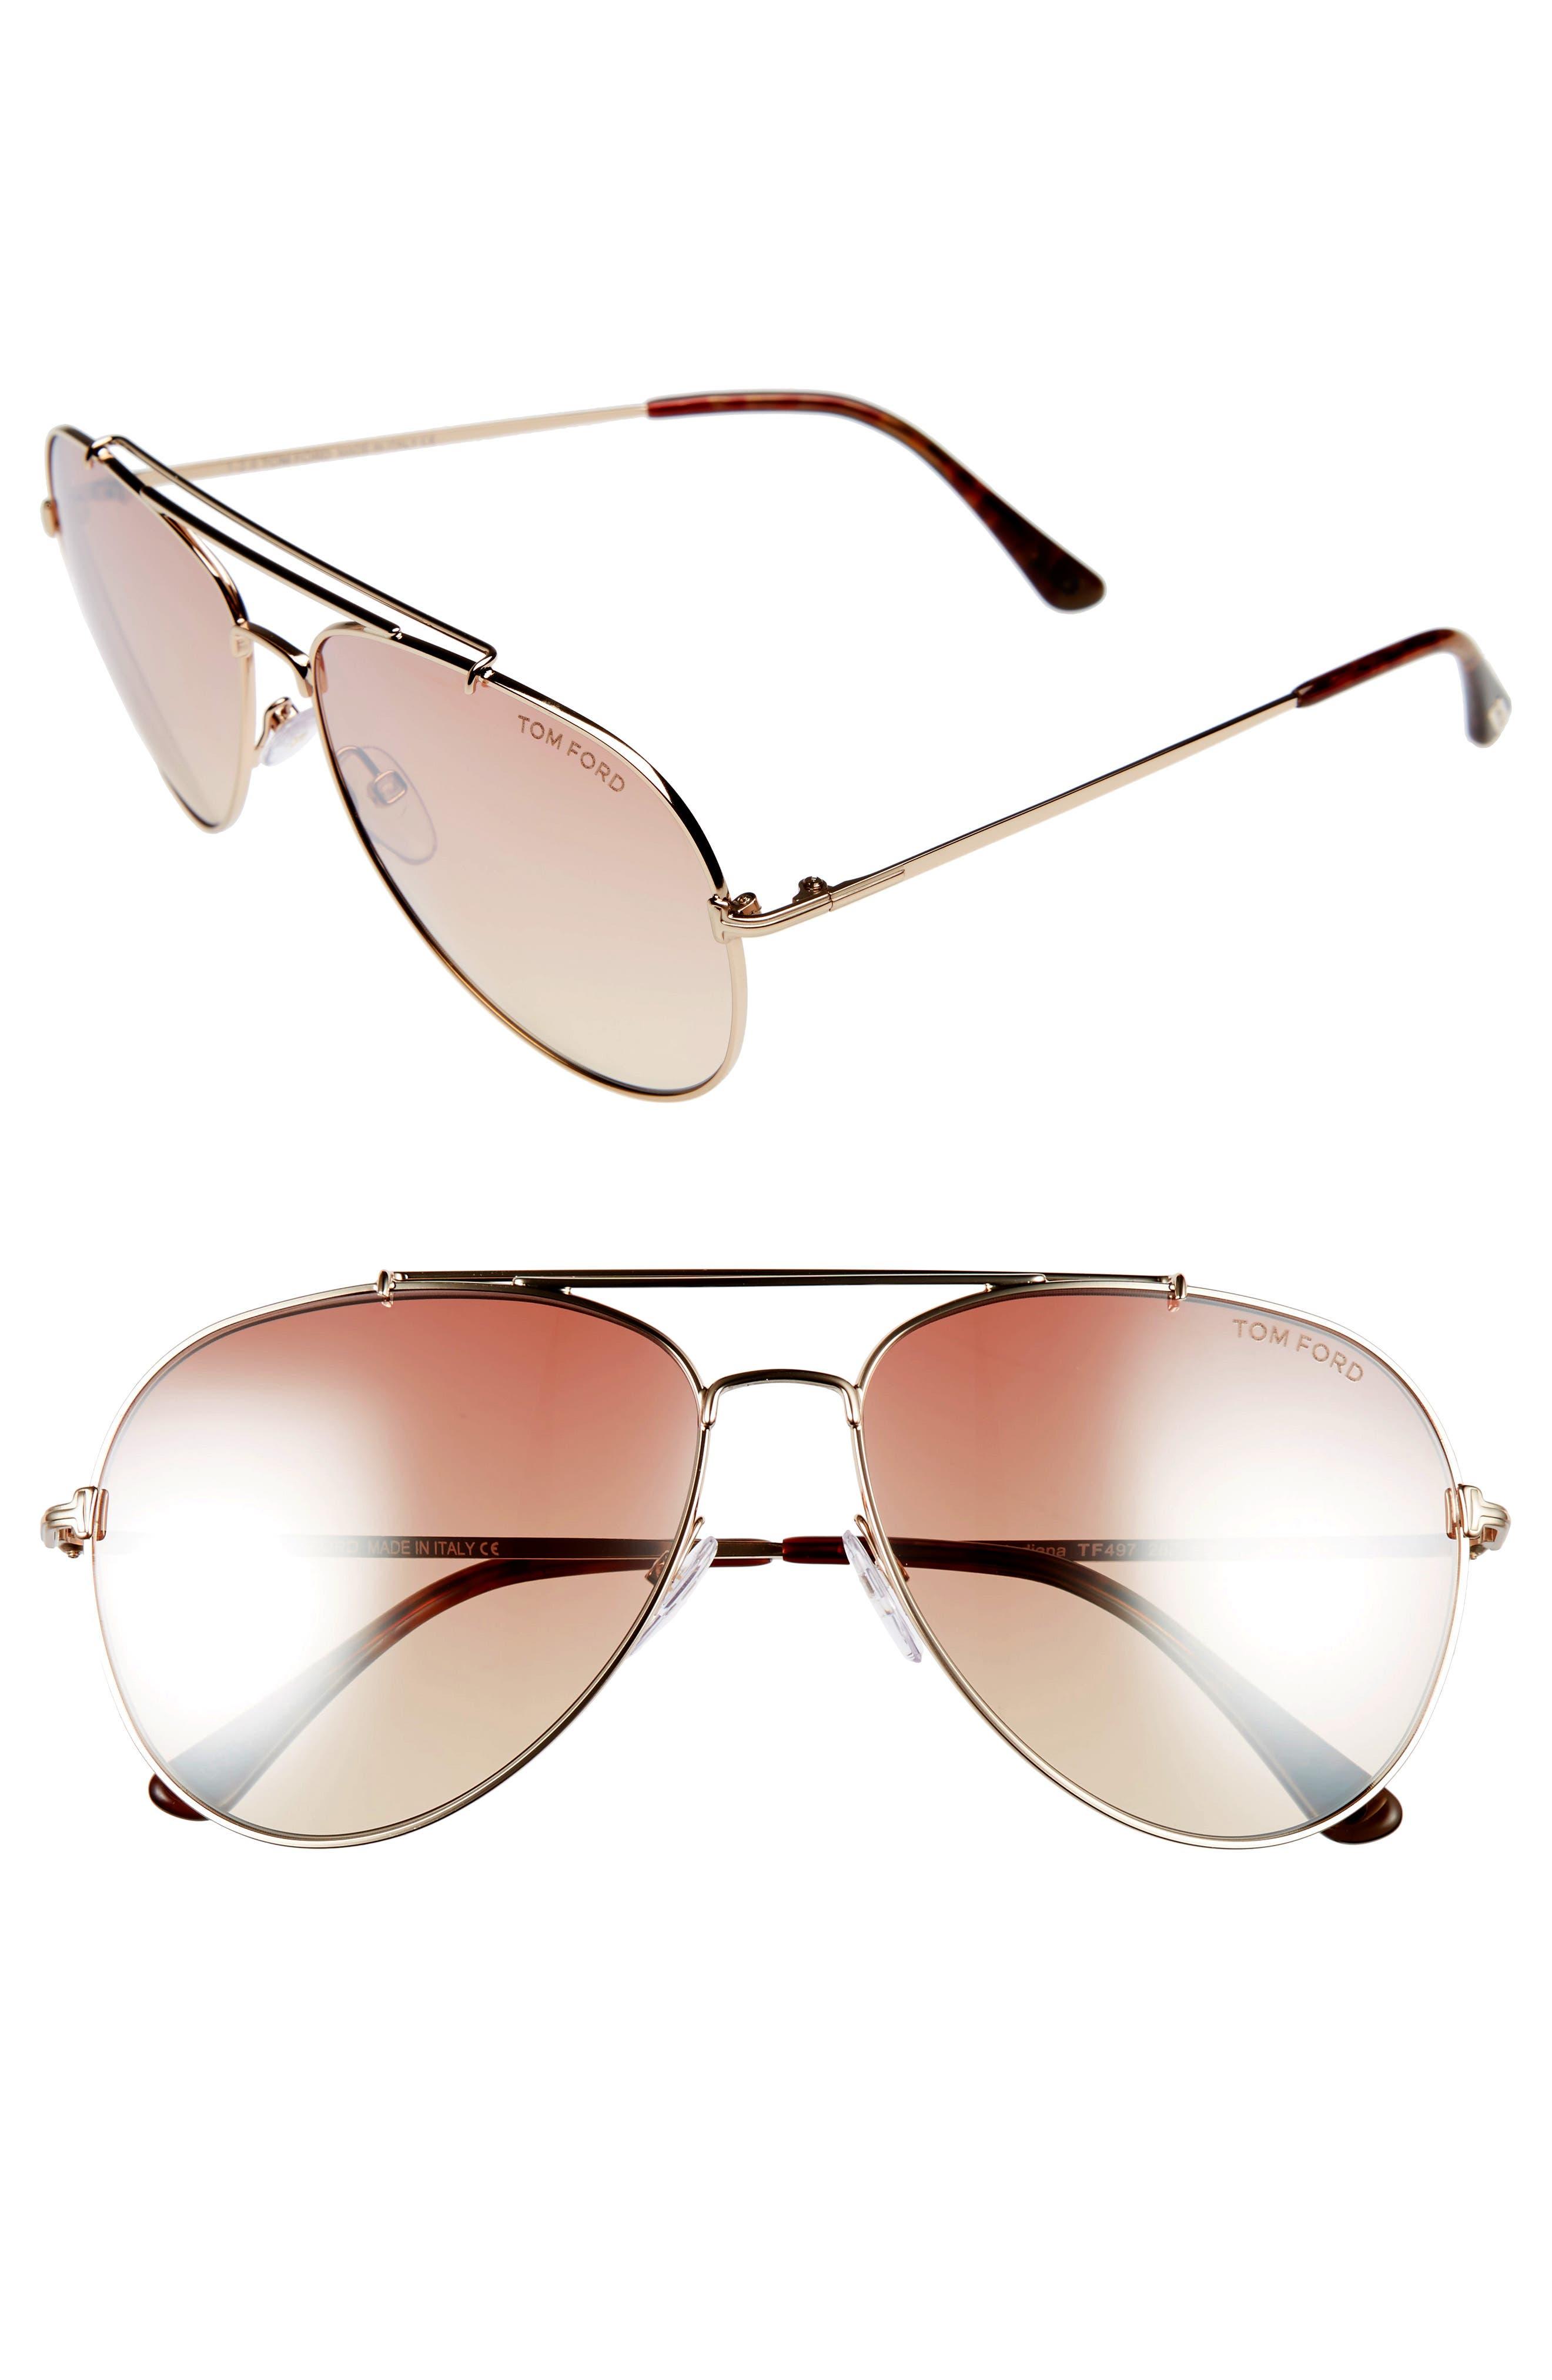 Main Image - Tom Ford Indiana 60mm Aviator Sunglasses